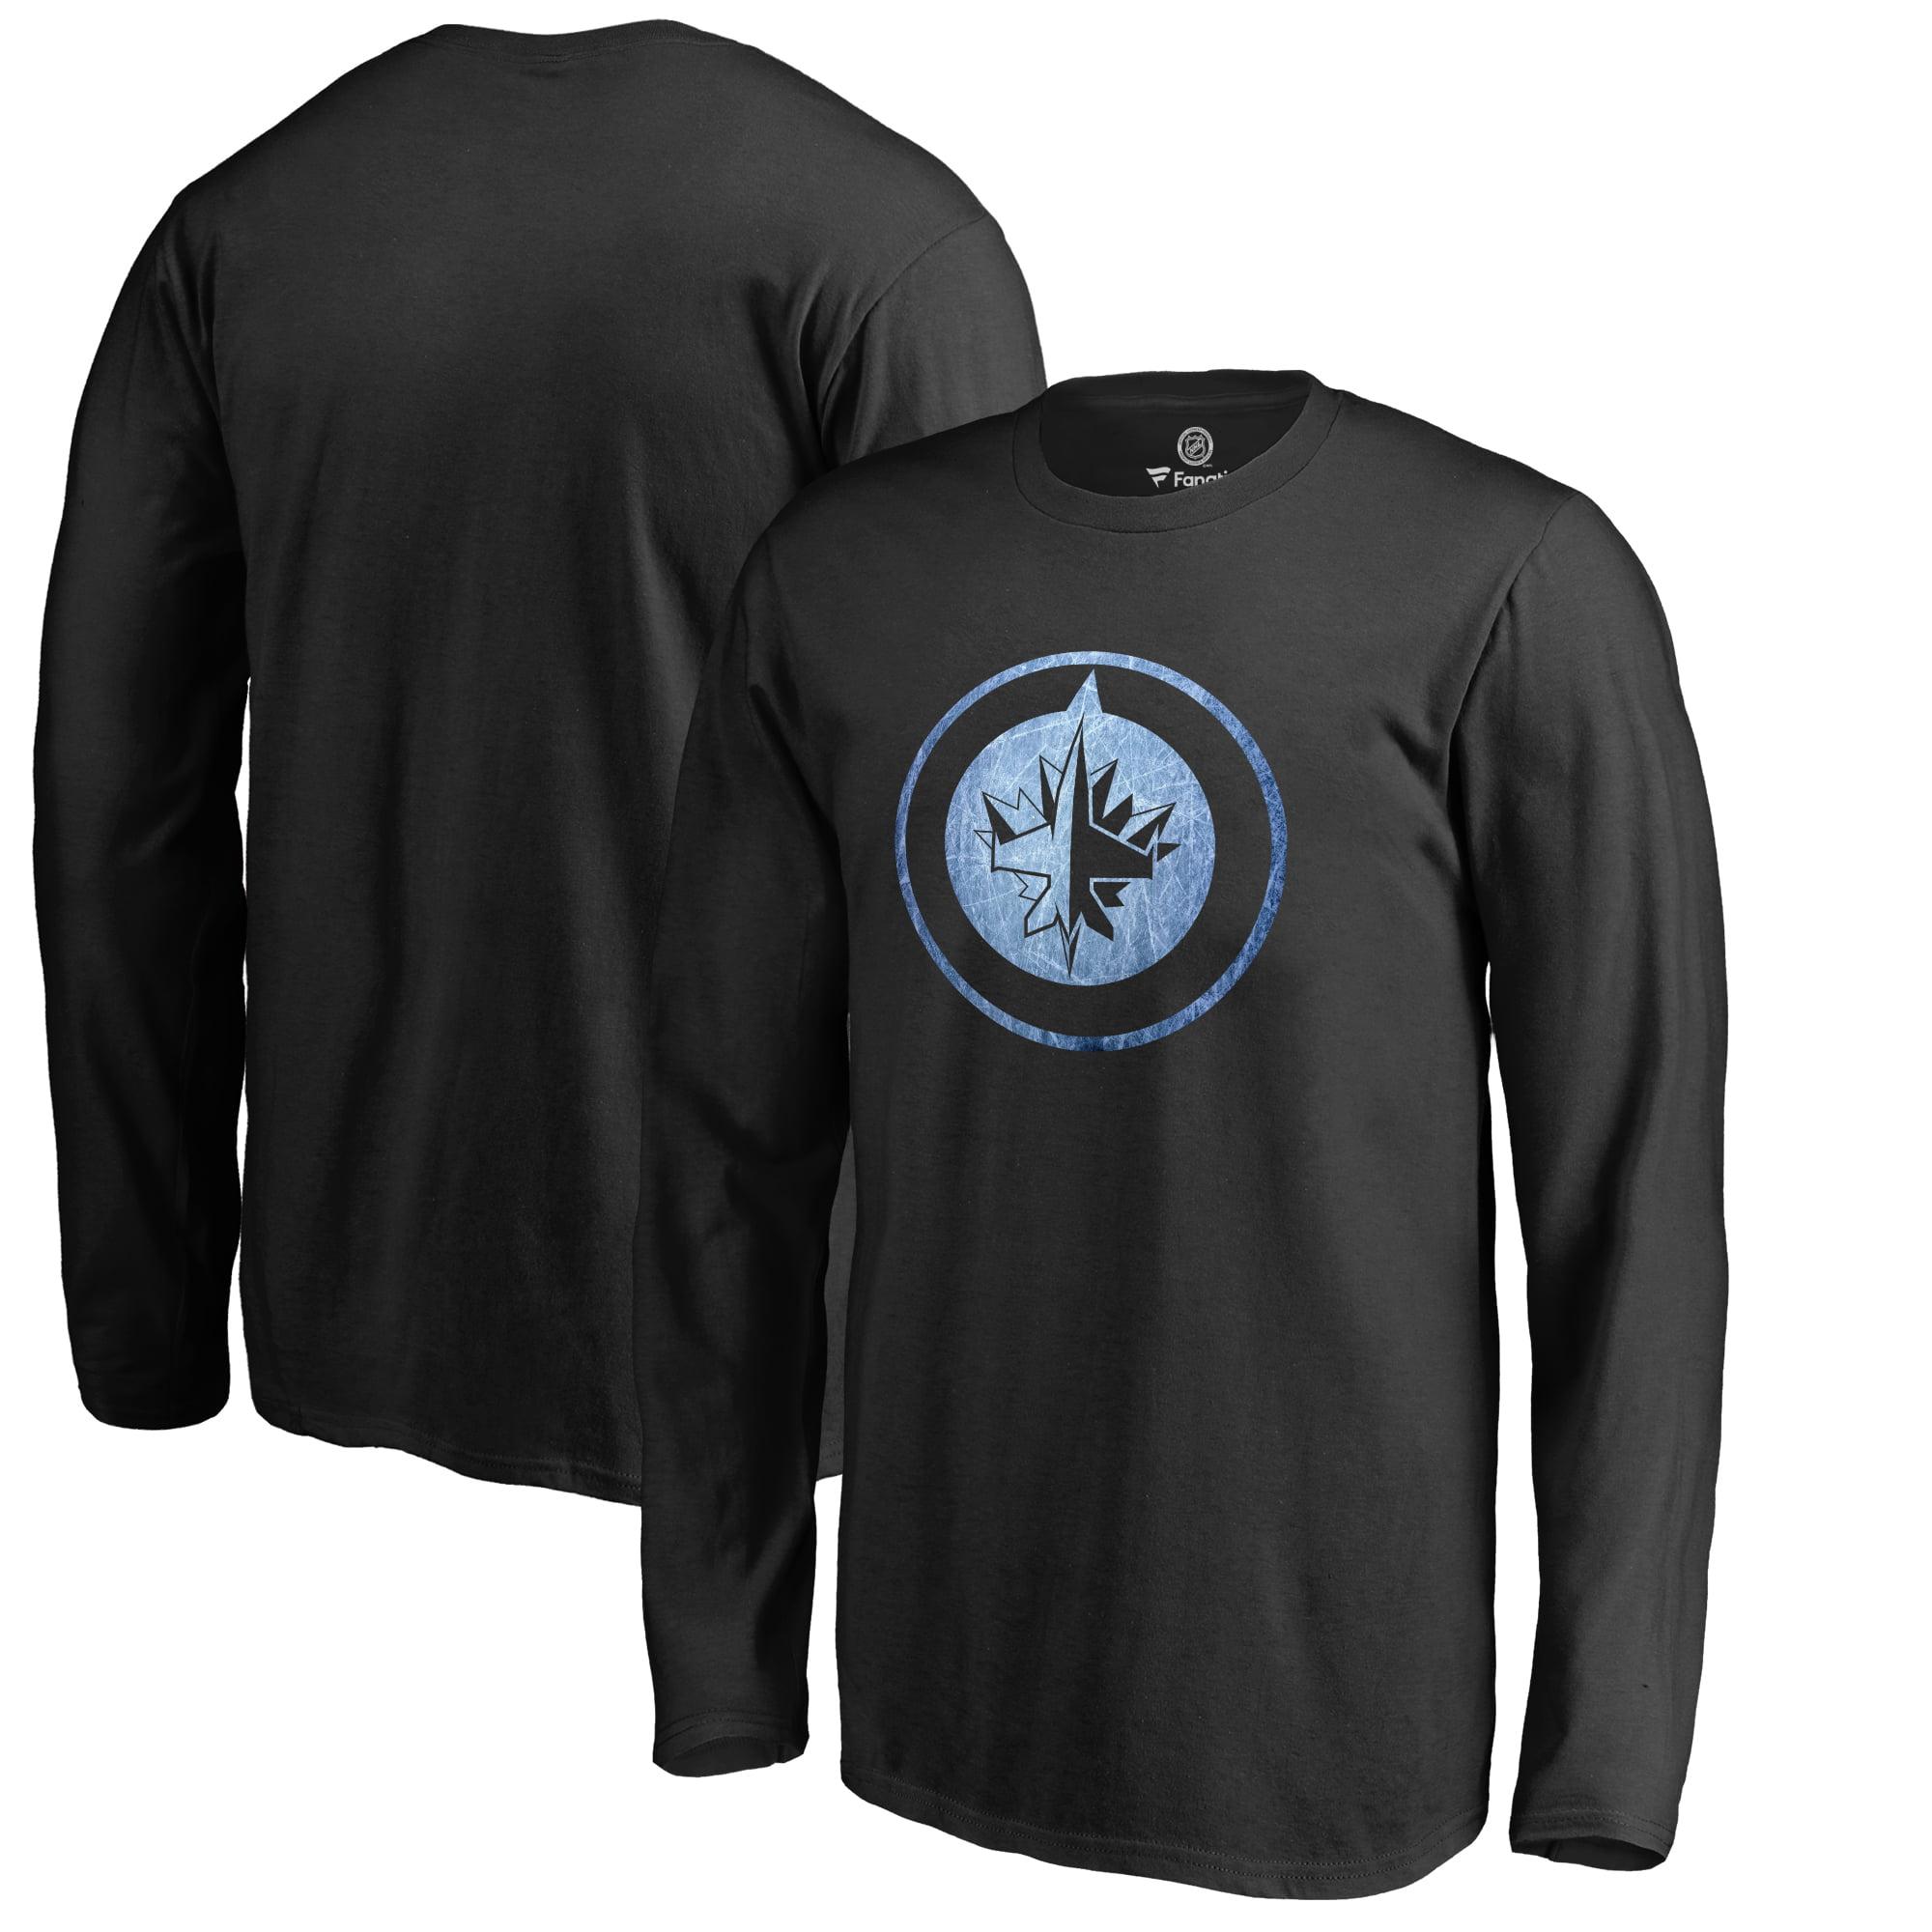 Winnipeg Jets Youth Pond Hockey Long Sleeve T-Shirt Black by Football Fanatics/Ruppshirts